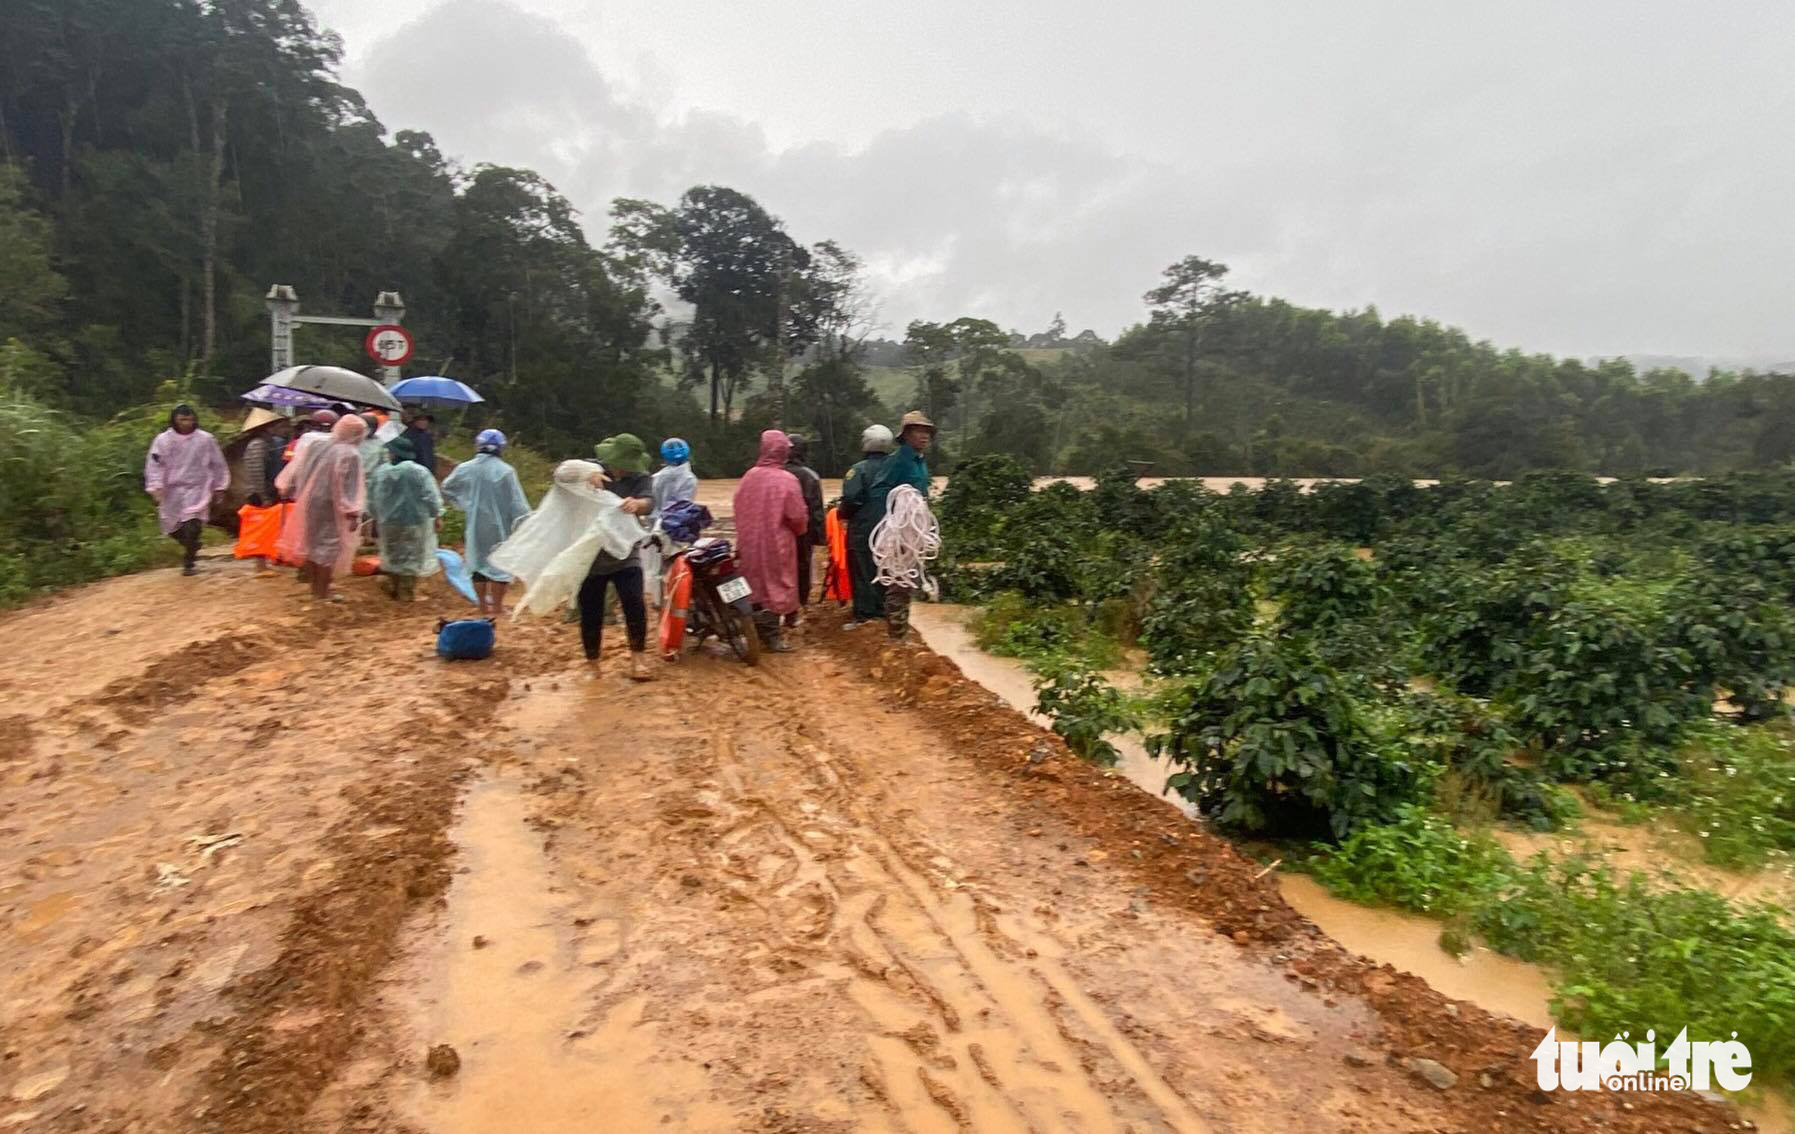 Tourists swept away by flood during trekking tour at Vietnam national park